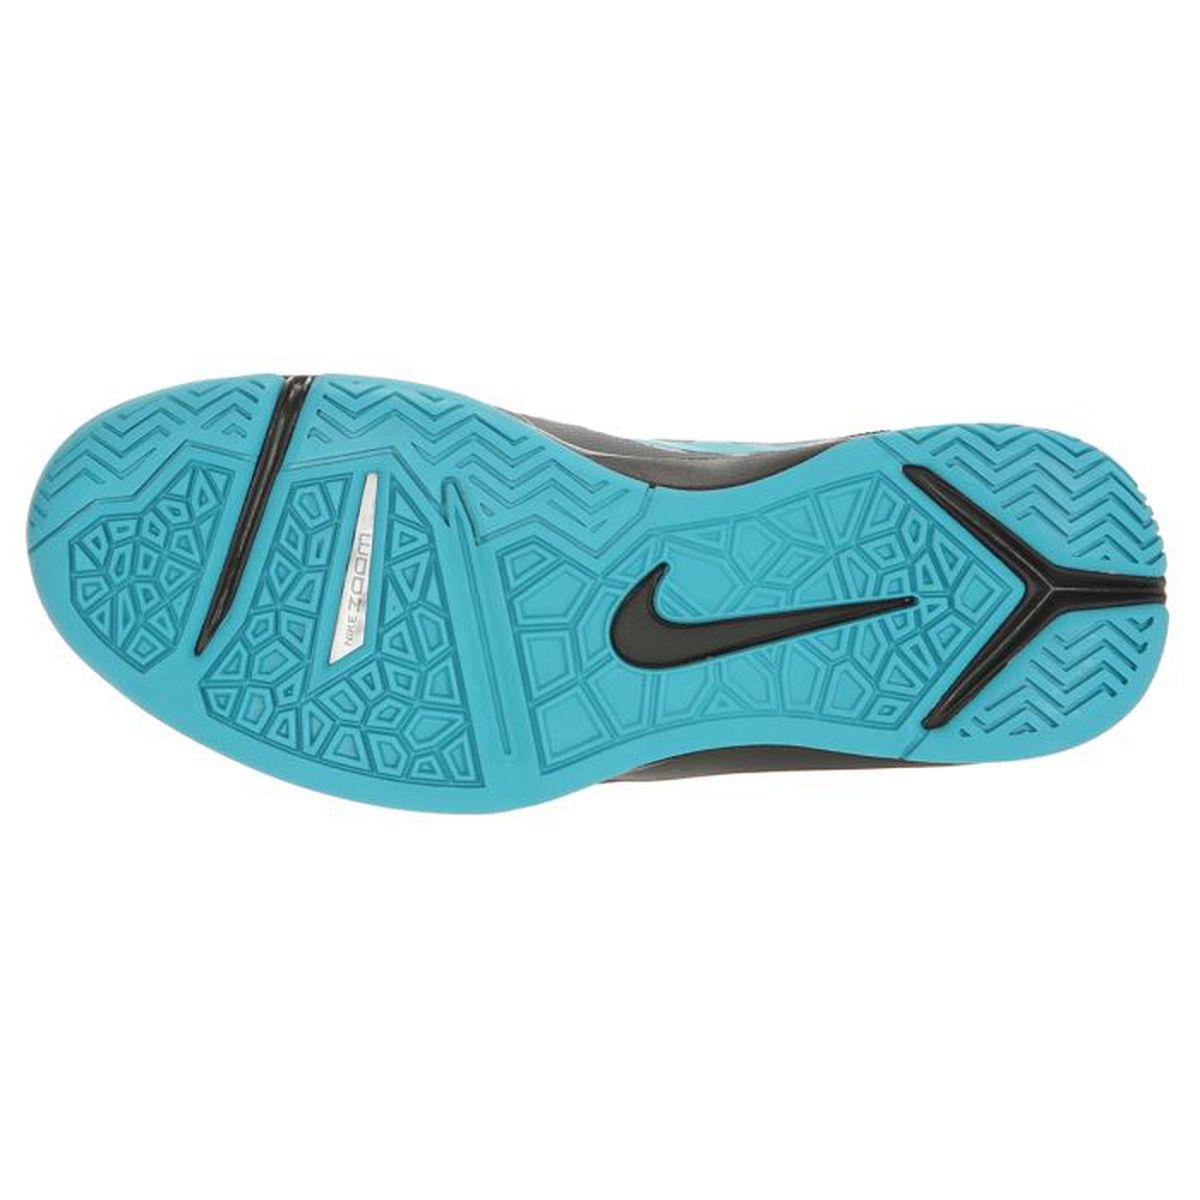 Nike De Homme Cher Ii Prix Chaussures Attero Basket Pas Zoom XPukZTOi